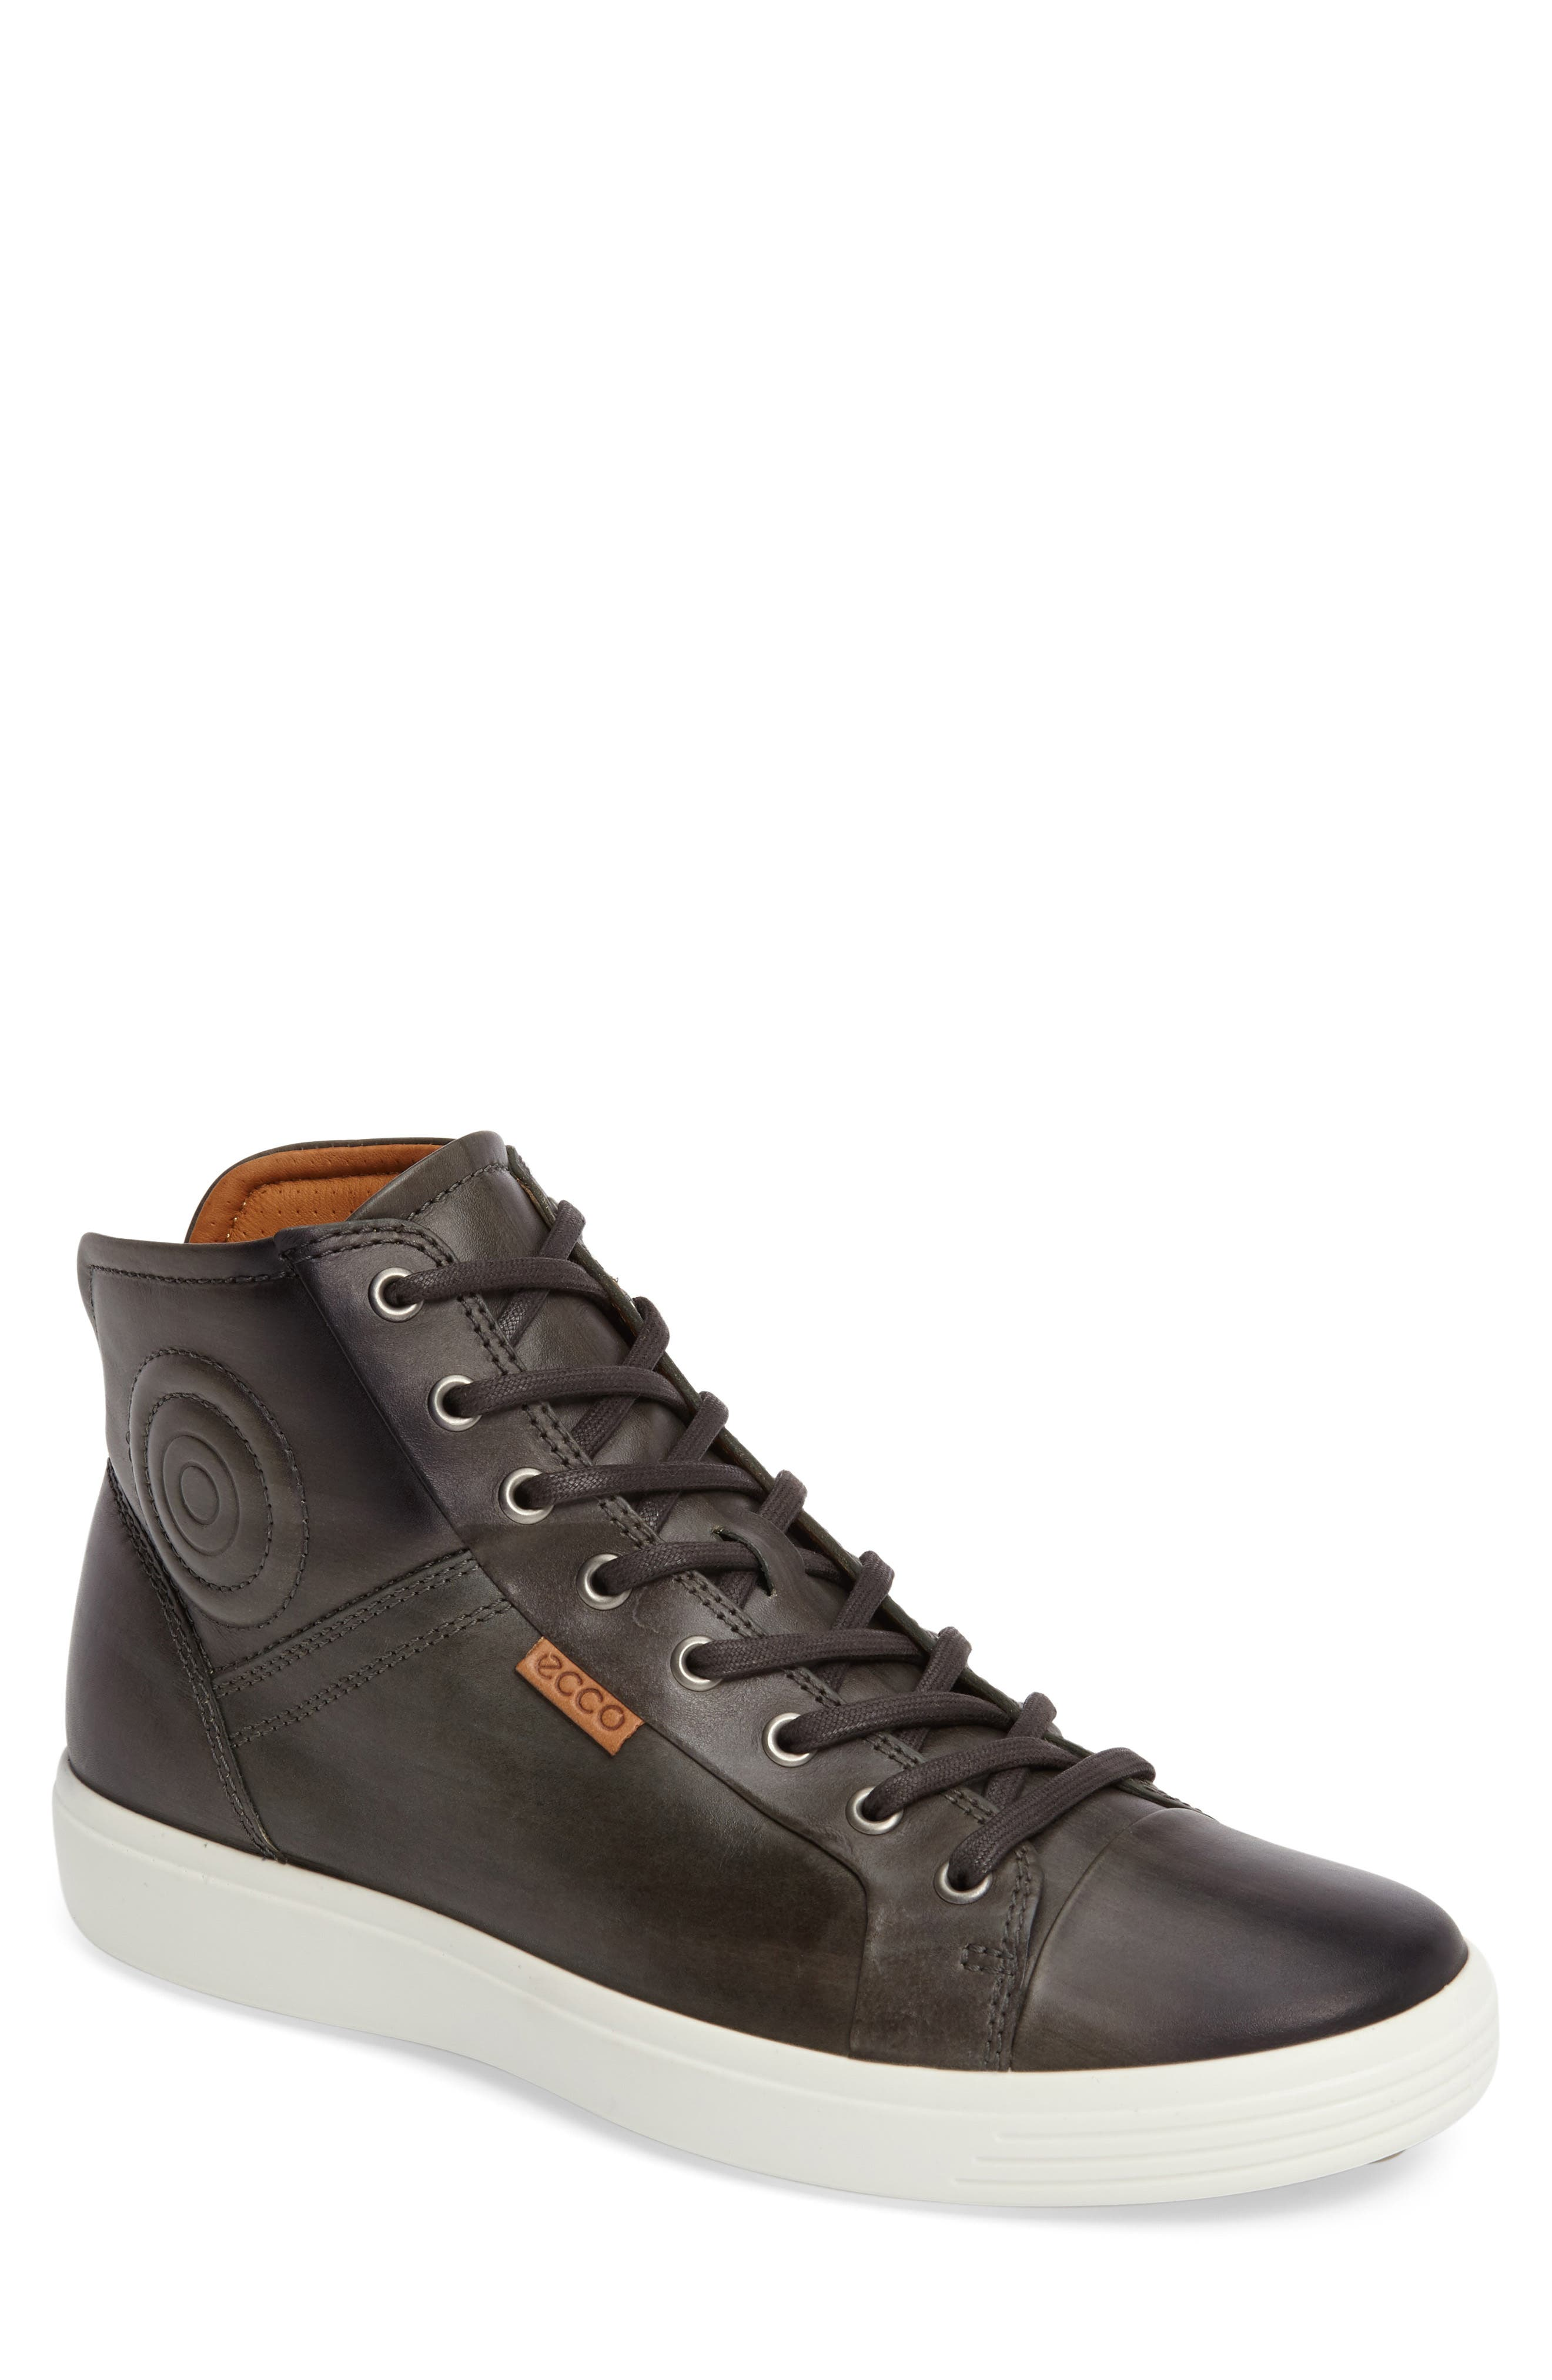 Alternate Image 1 Selected - ECCO Soft 7 High Top Sneaker (Men)